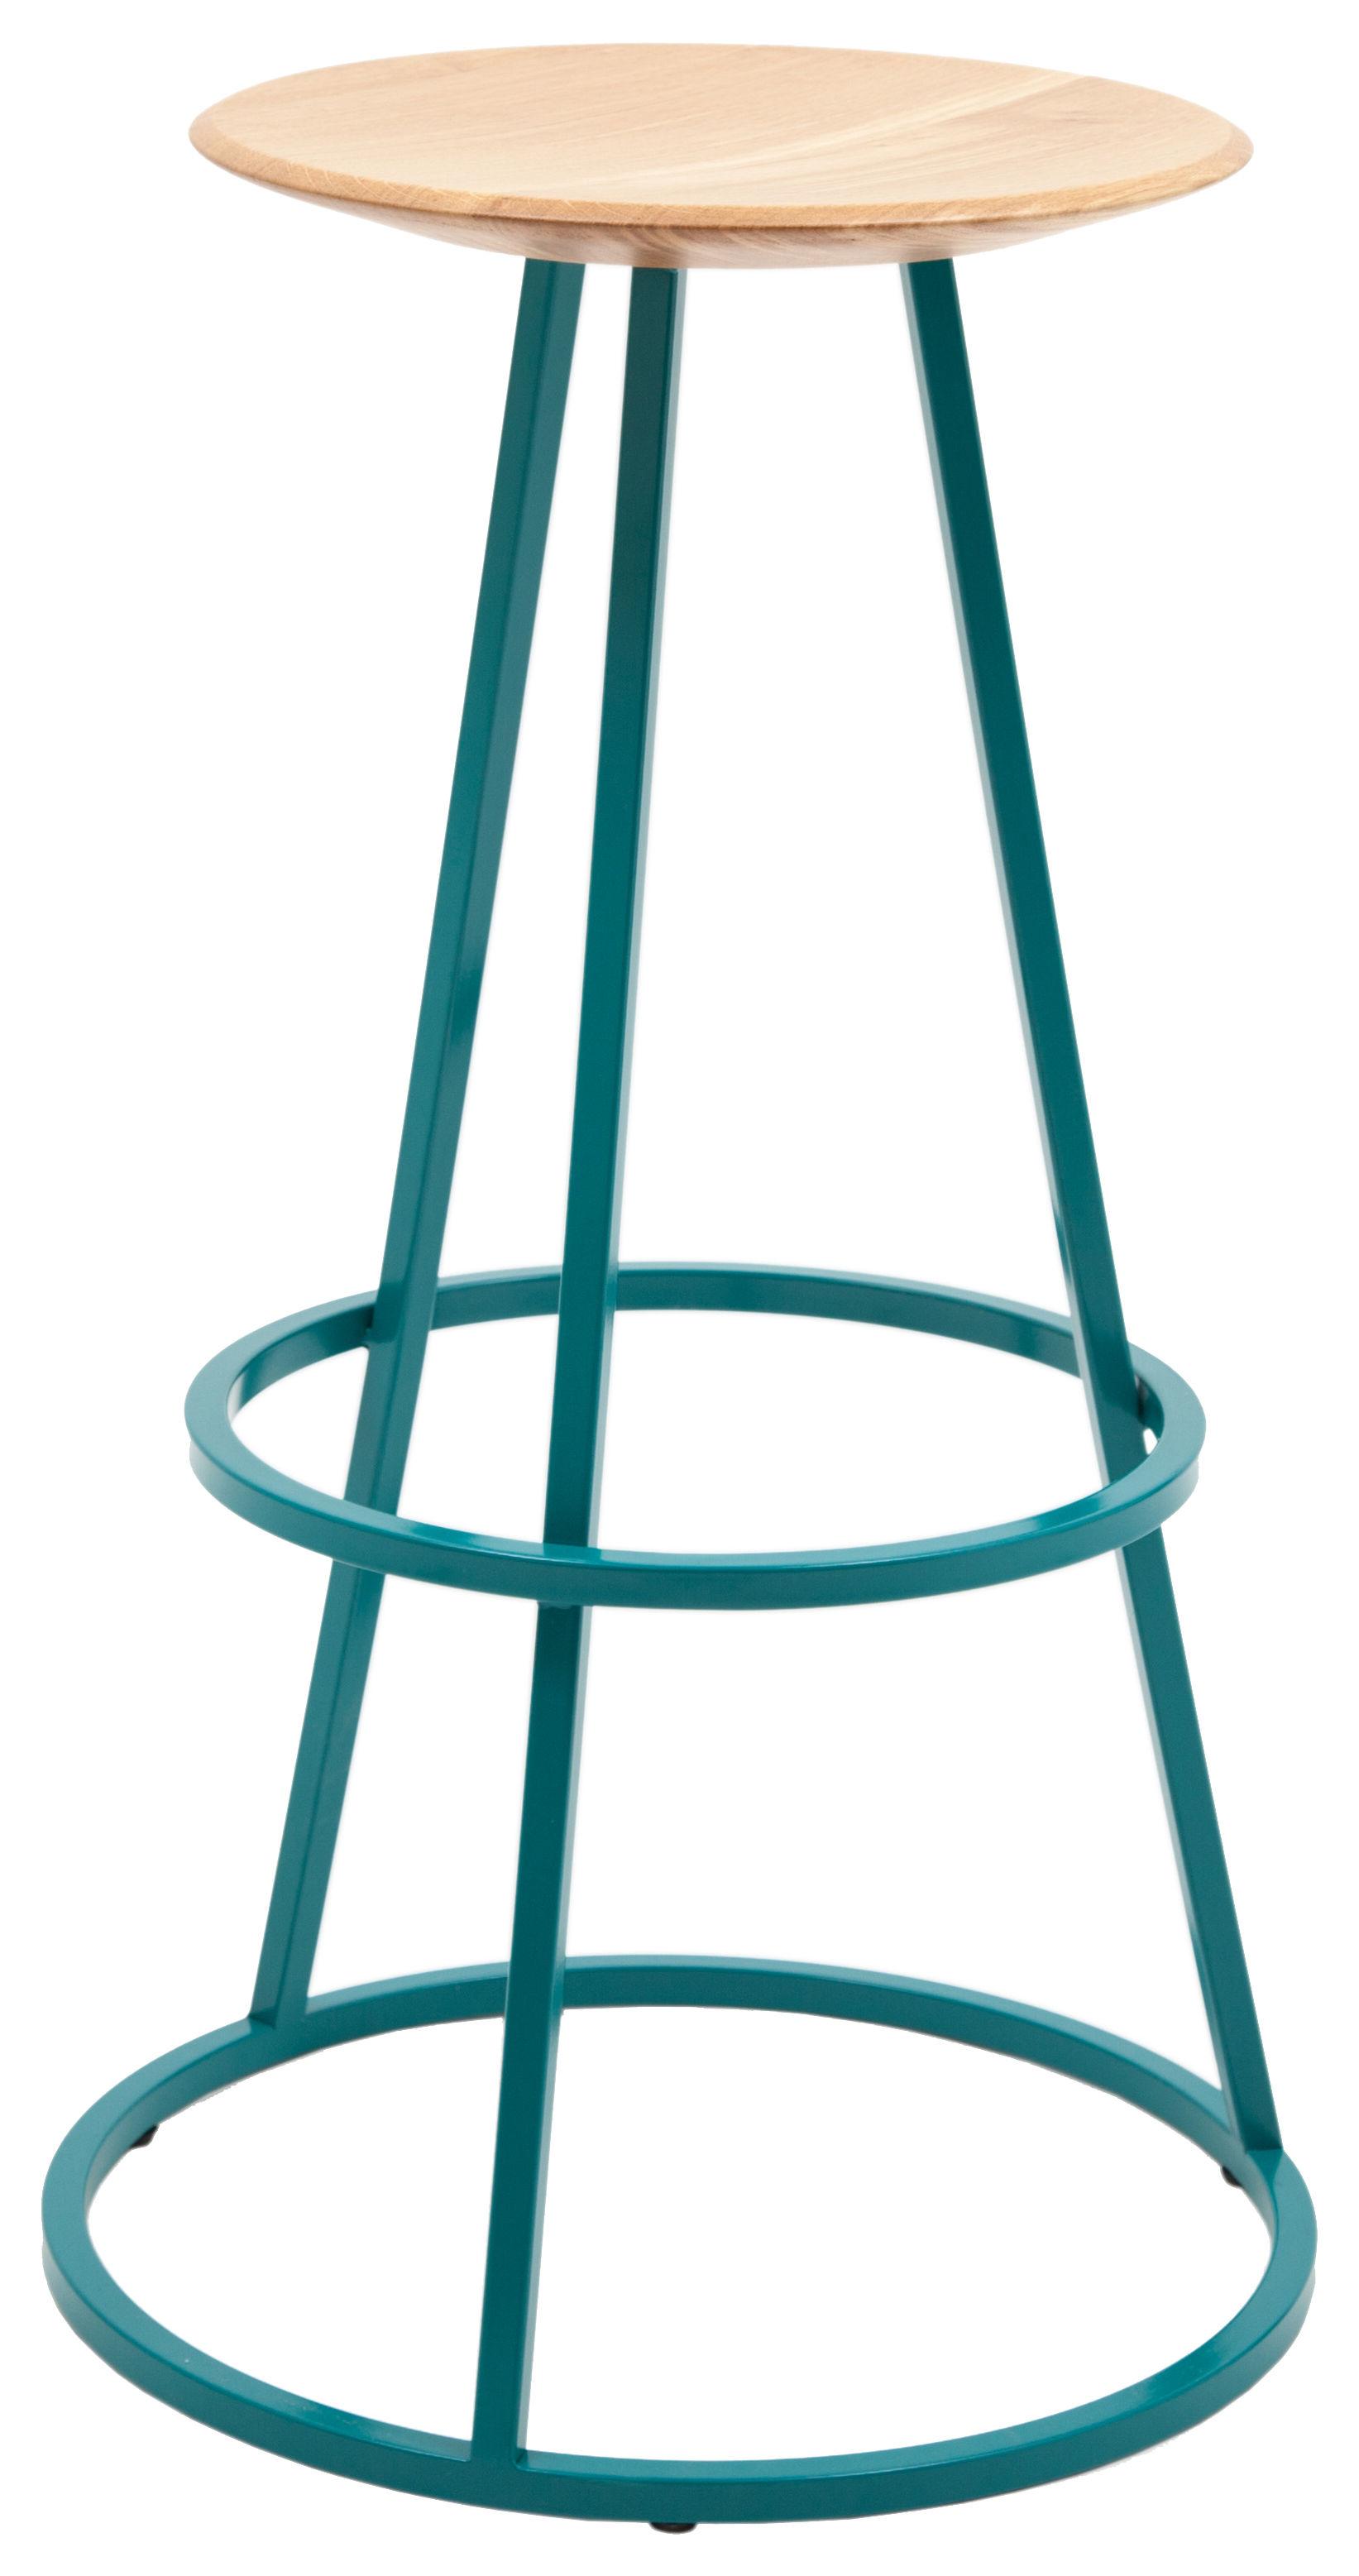 Möbel - Barhocker - Grand Gustave Barhocker / H 77cm - Hartô - Meeresblau - lackierter Stahl, massive Eiche